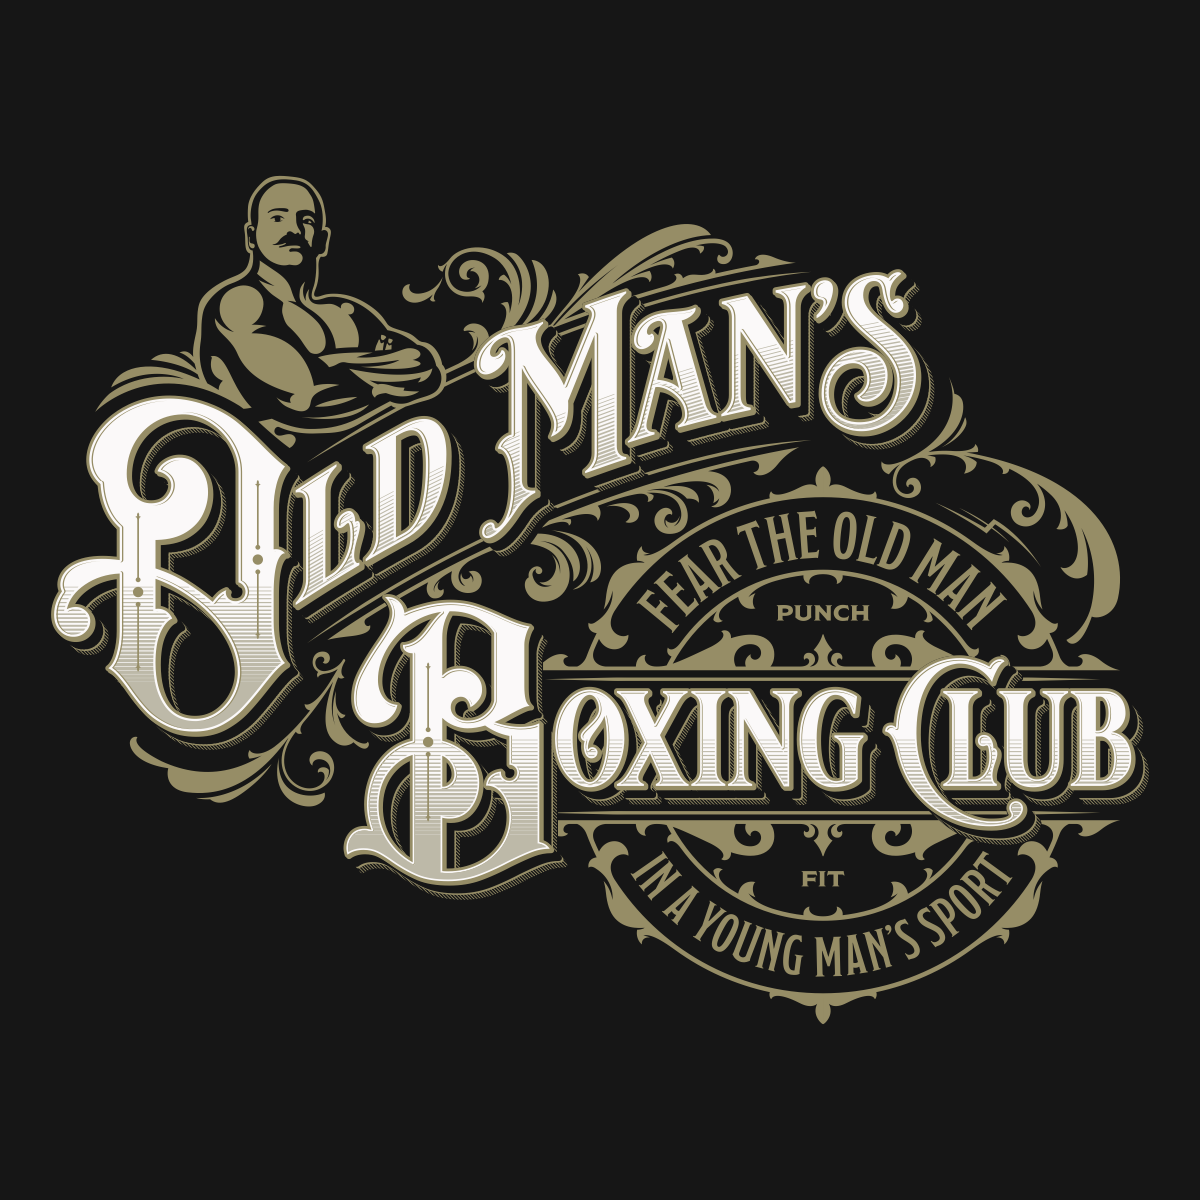 Old men boxing club